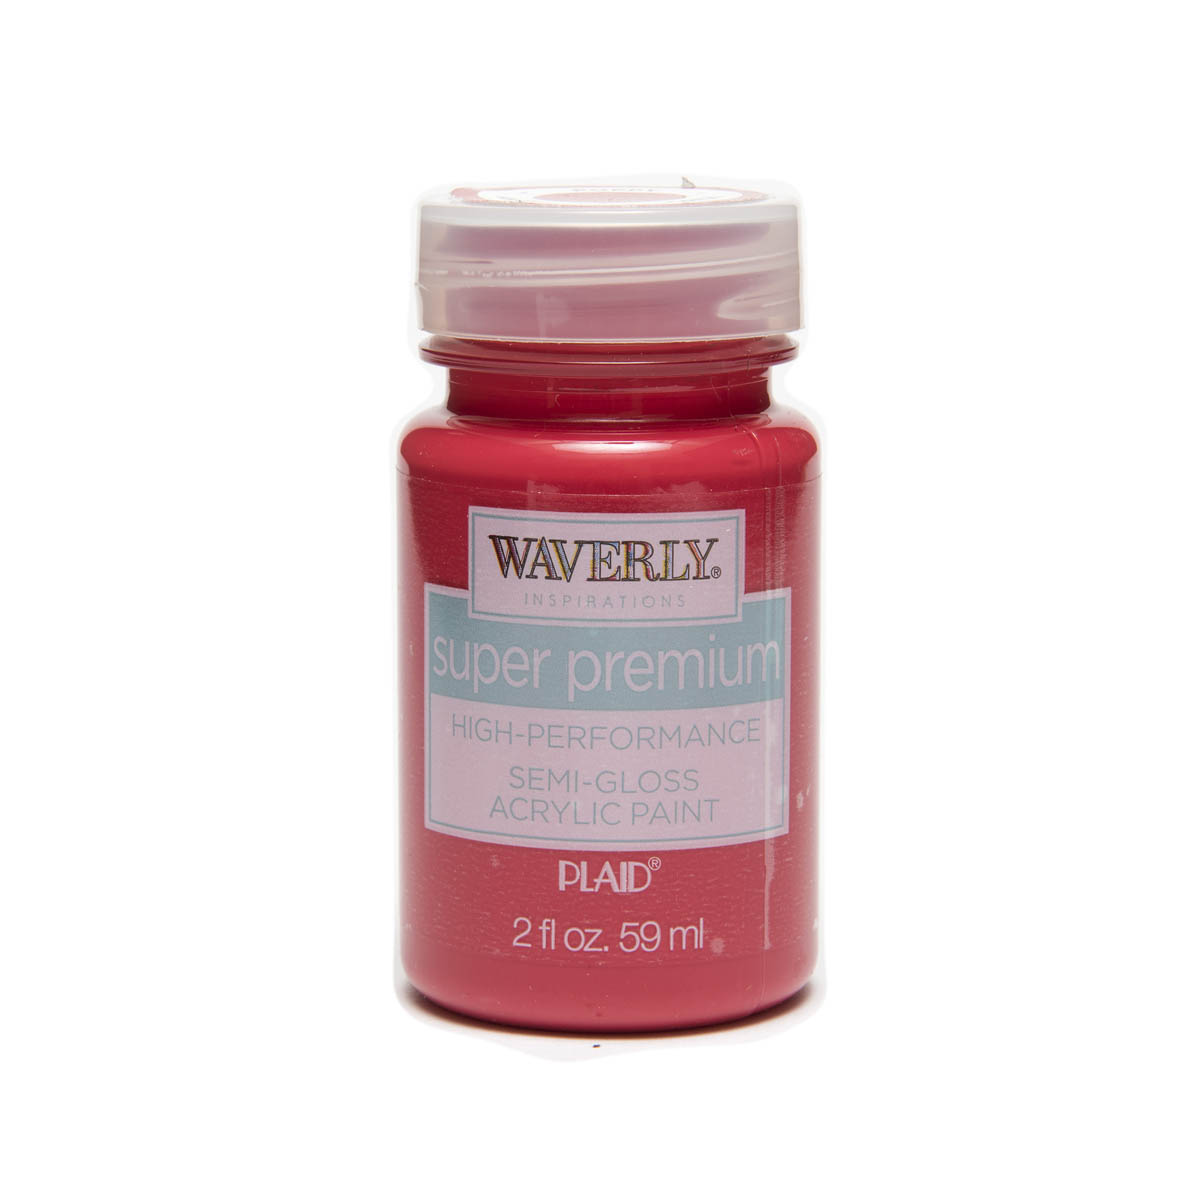 Waverly ® Inspirations Super Premium Semi-Gloss Acrylic Paint - Poppy, 2 oz.